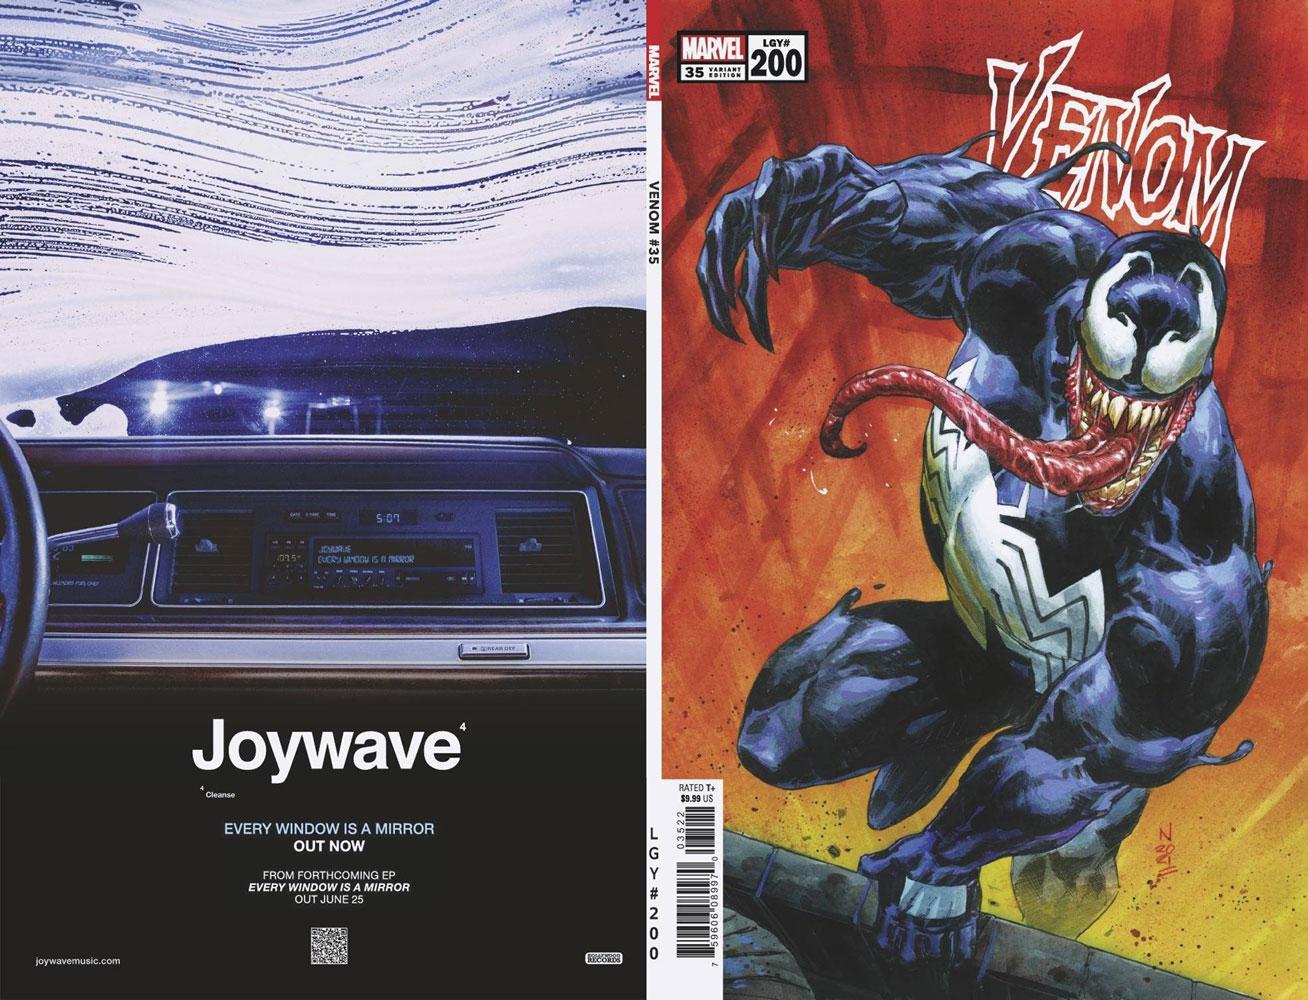 Venom #35 (200th issue) (variant cover - Nic Klein) - Marvel Comics